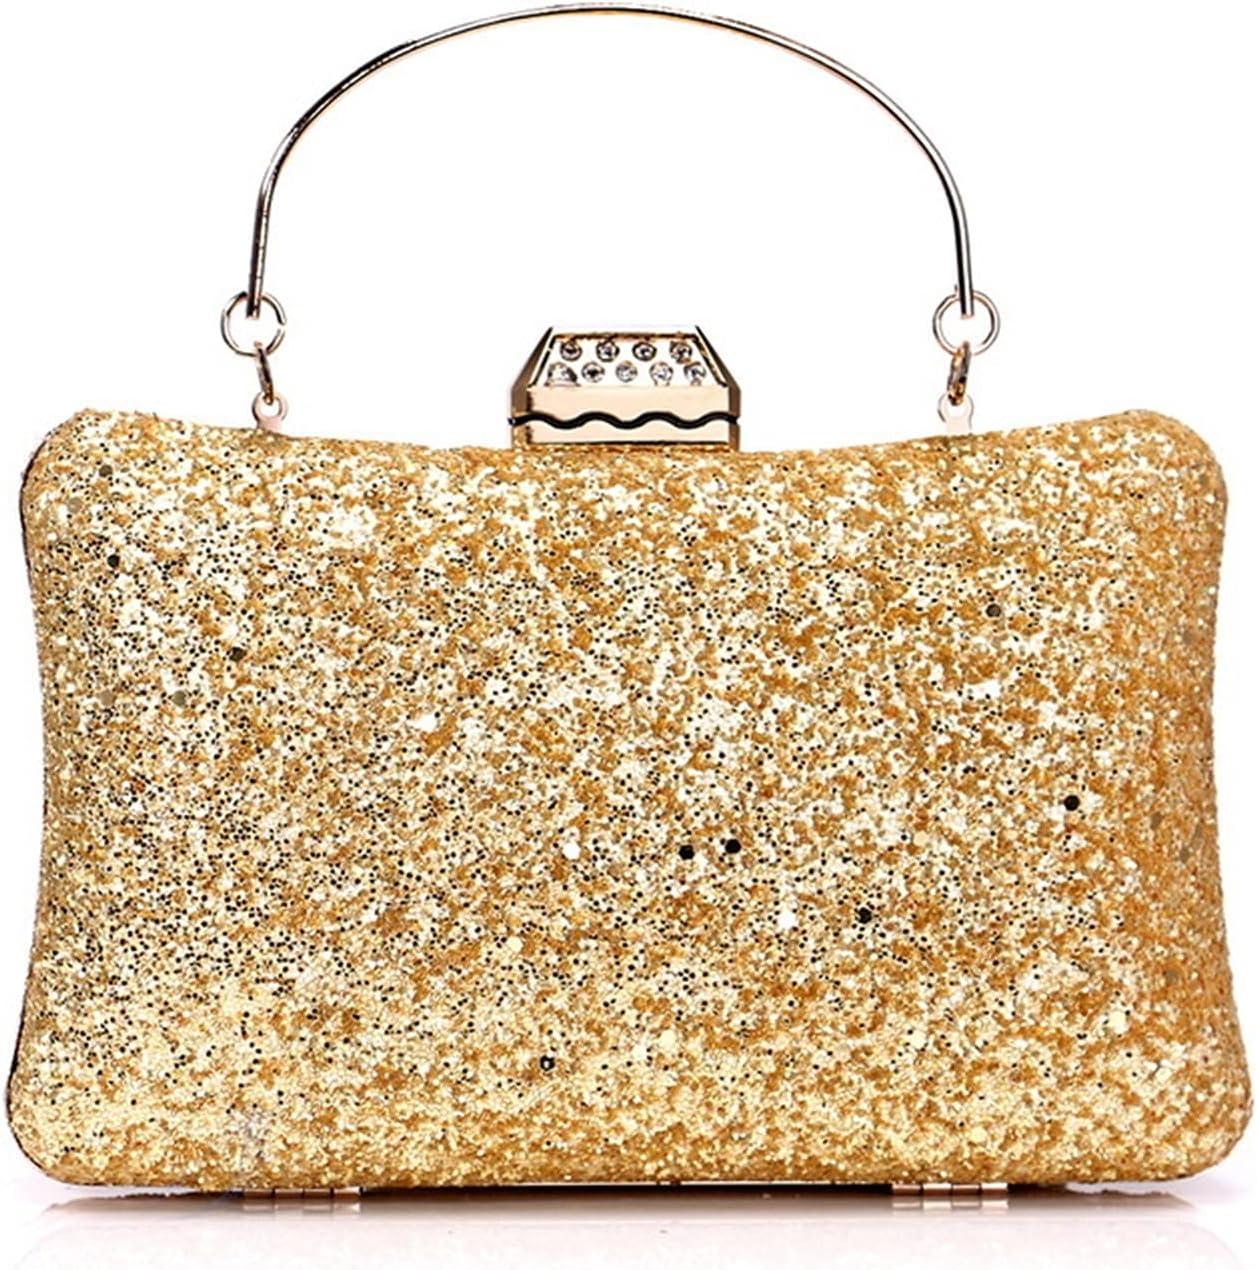 Mubolin Glitter Evening Clutch Bag Rhinestone Handbag Leather Crossbody Shoulder Purse Wedding Cocktail Party Bag for Women and Girls (Color : Golden)